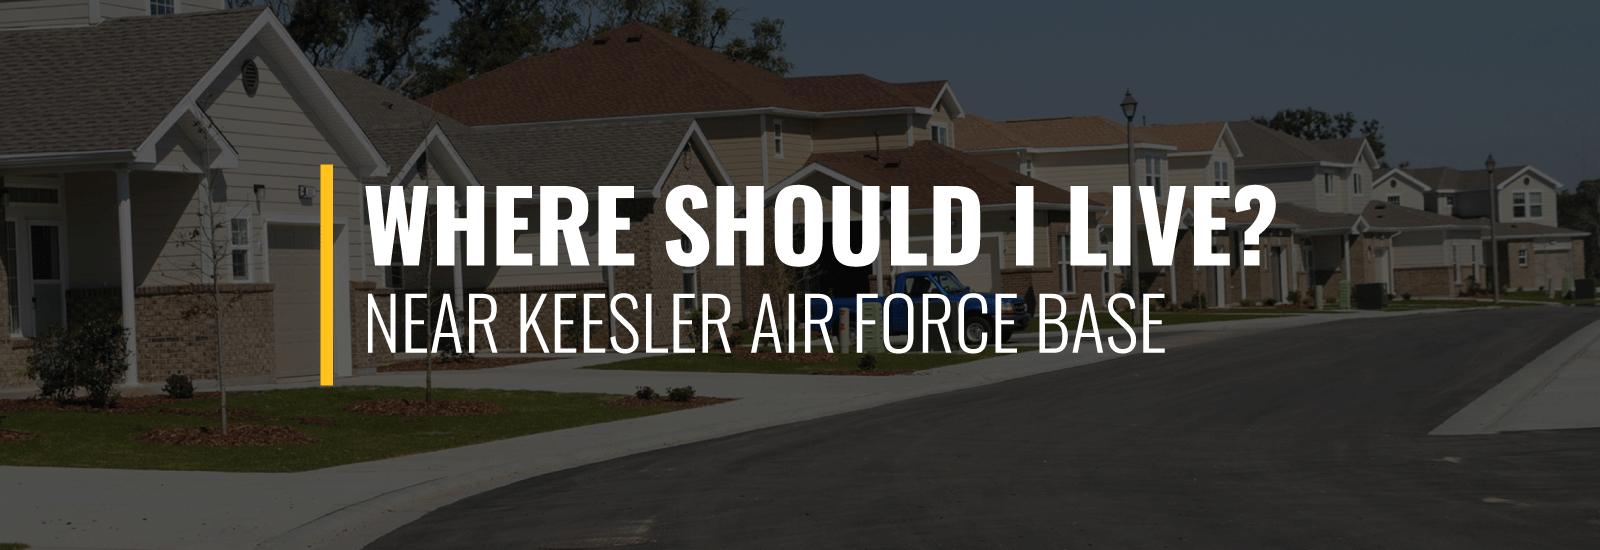 Where Should I Live Near Keesler Air Force Base?